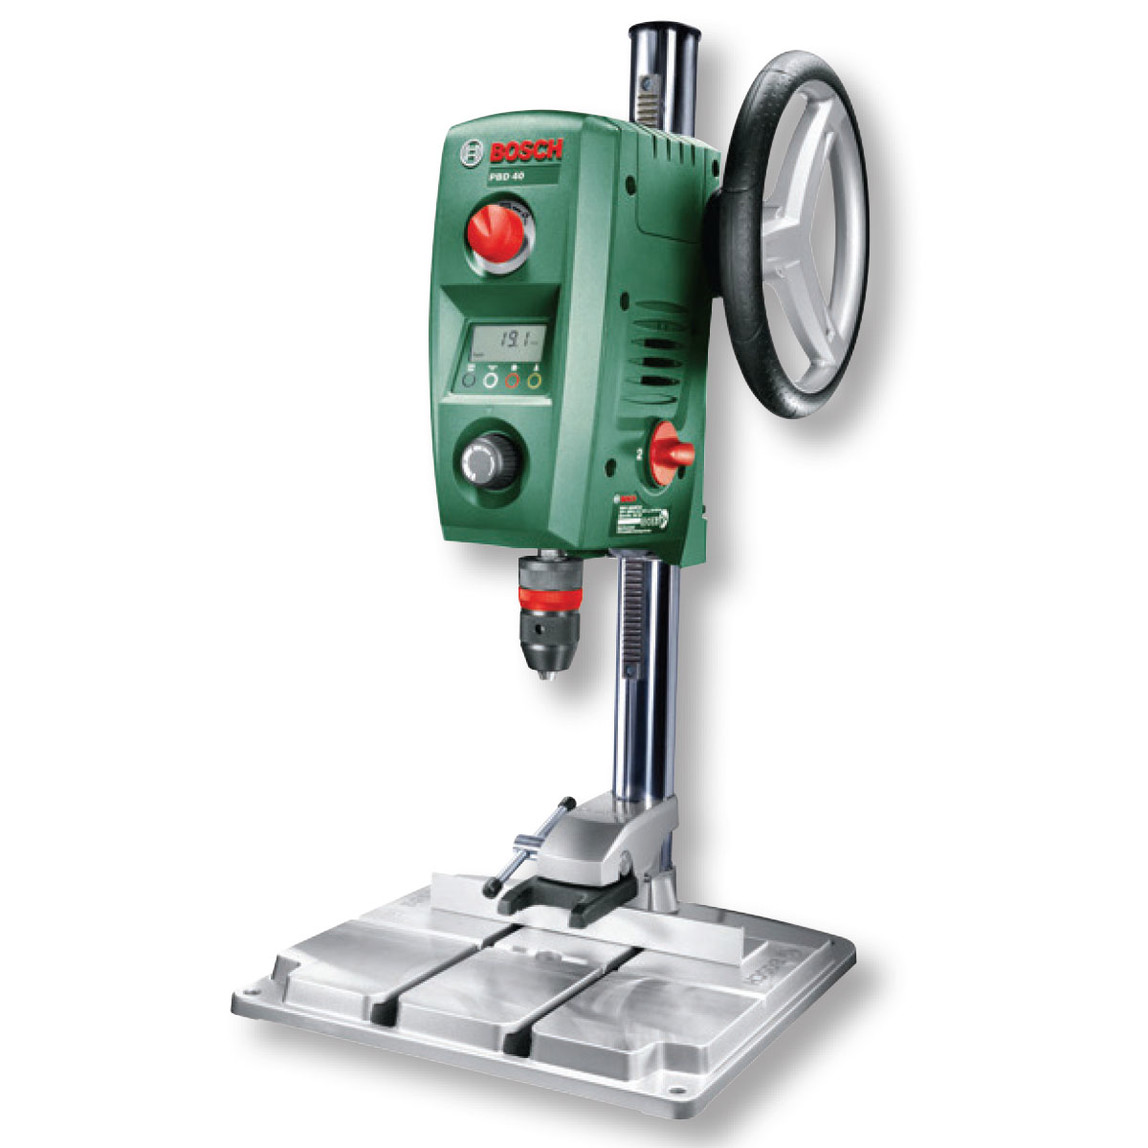 Bosch Pbd40 710W Tezgah Tipi Matkap